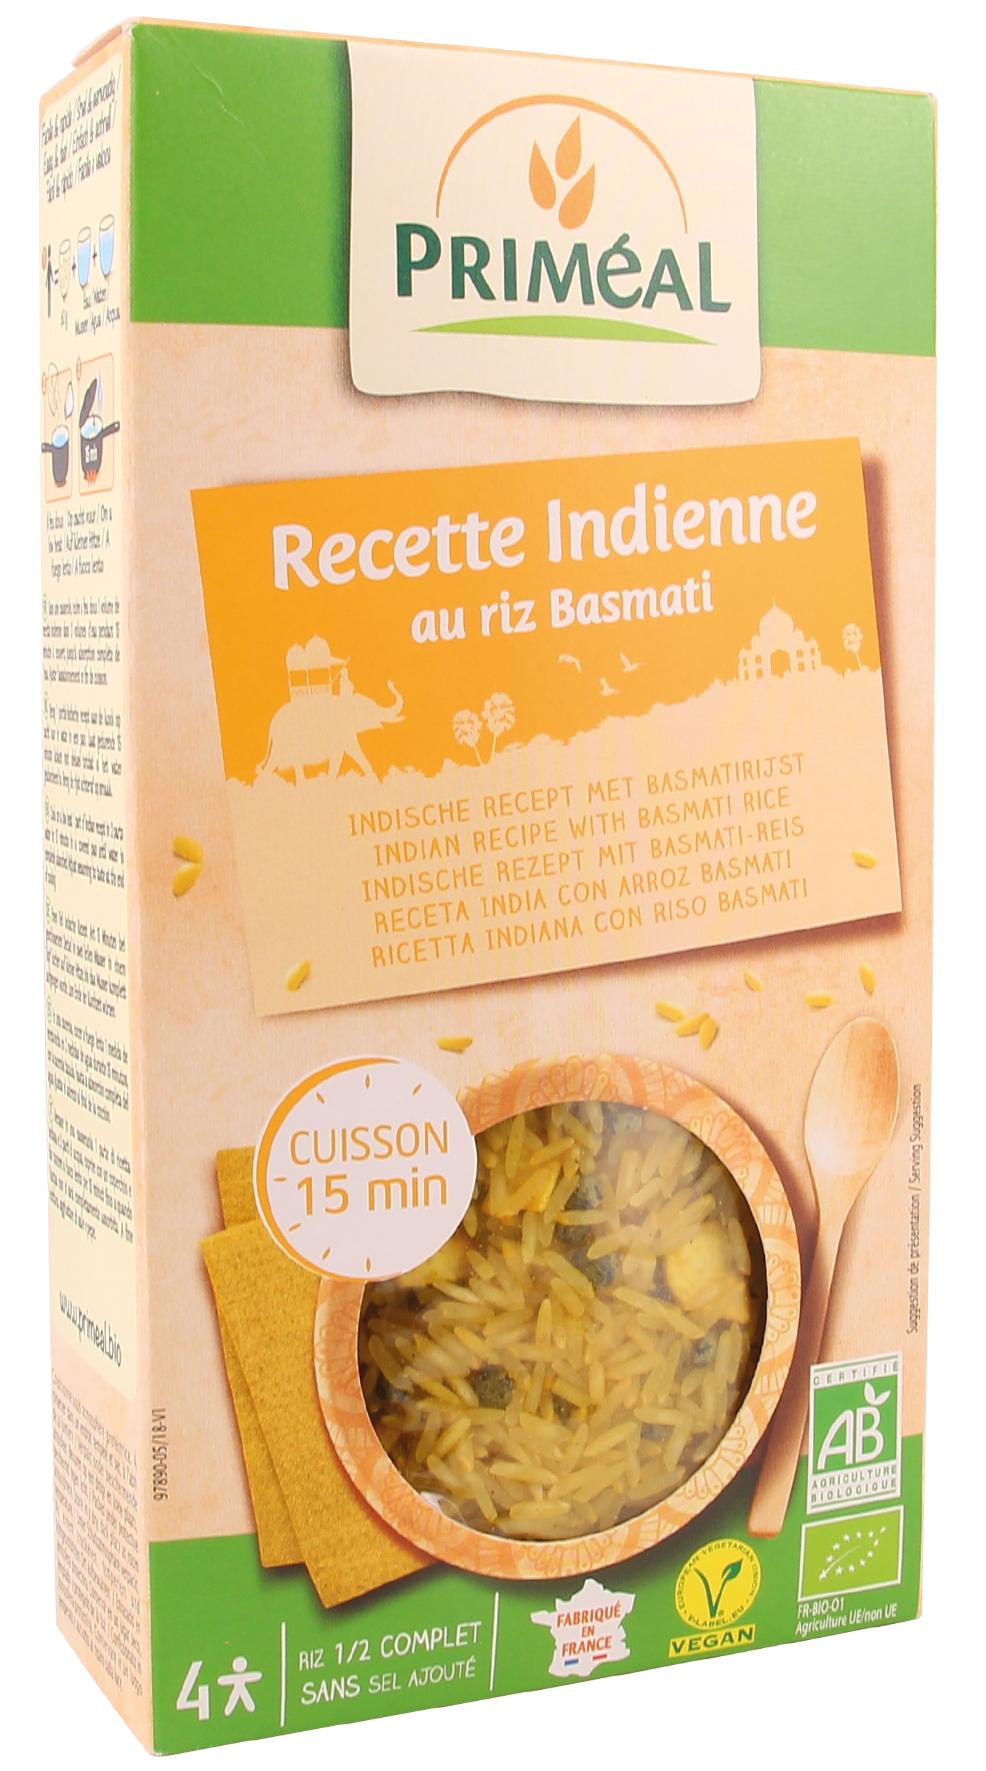 Riz basmati recette indienne, Priméal (250 g)